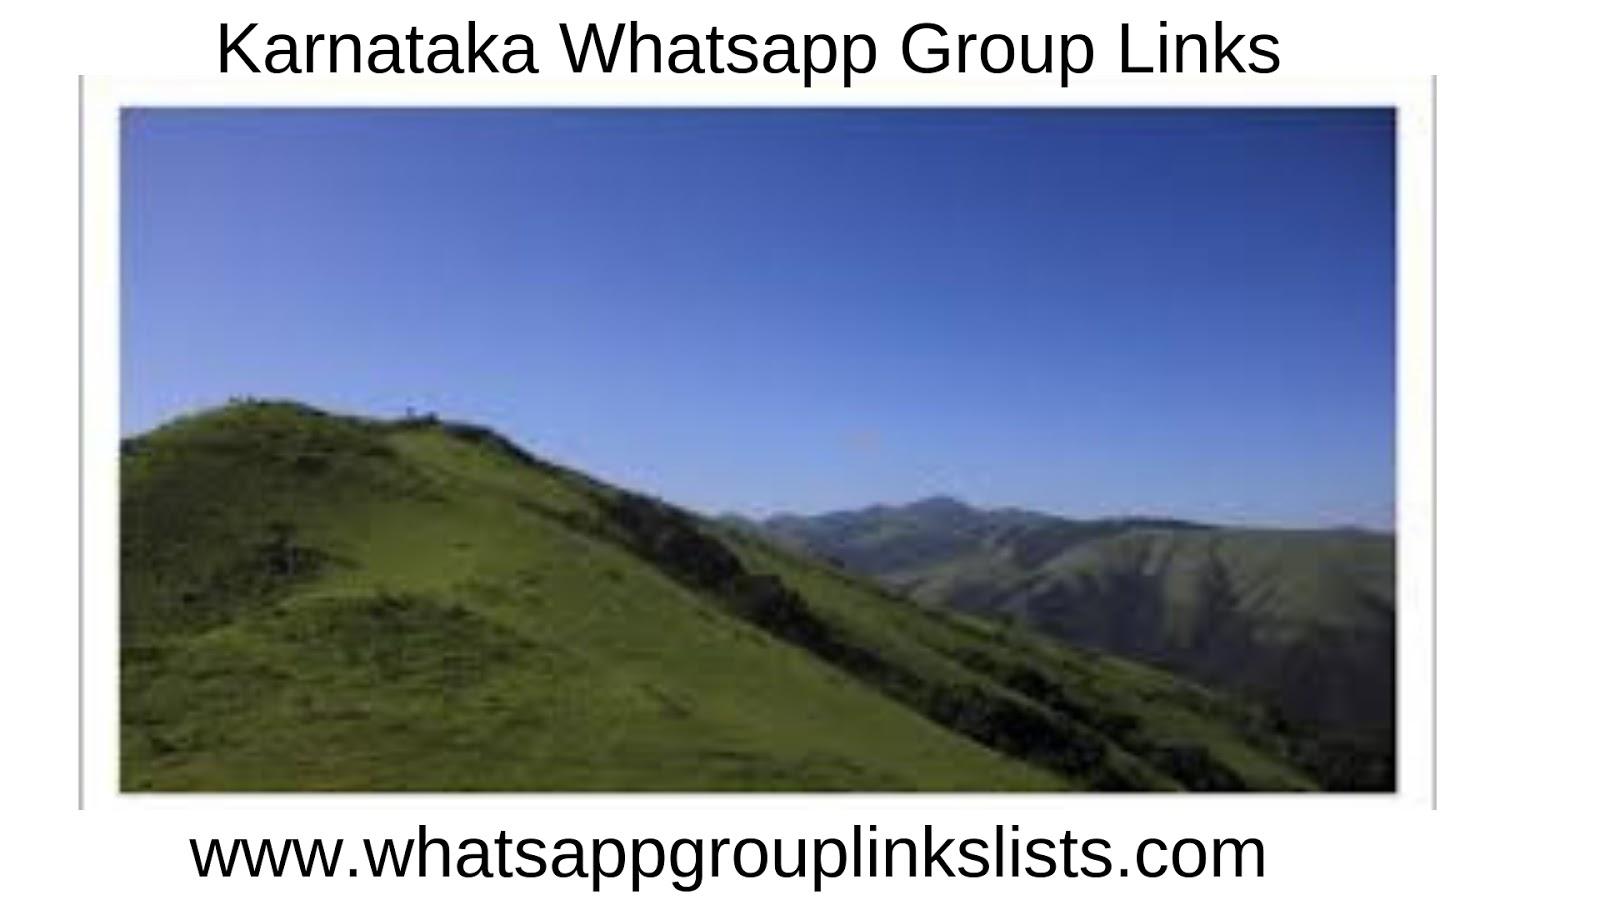 Join karnataka Whatsapp Group Links List